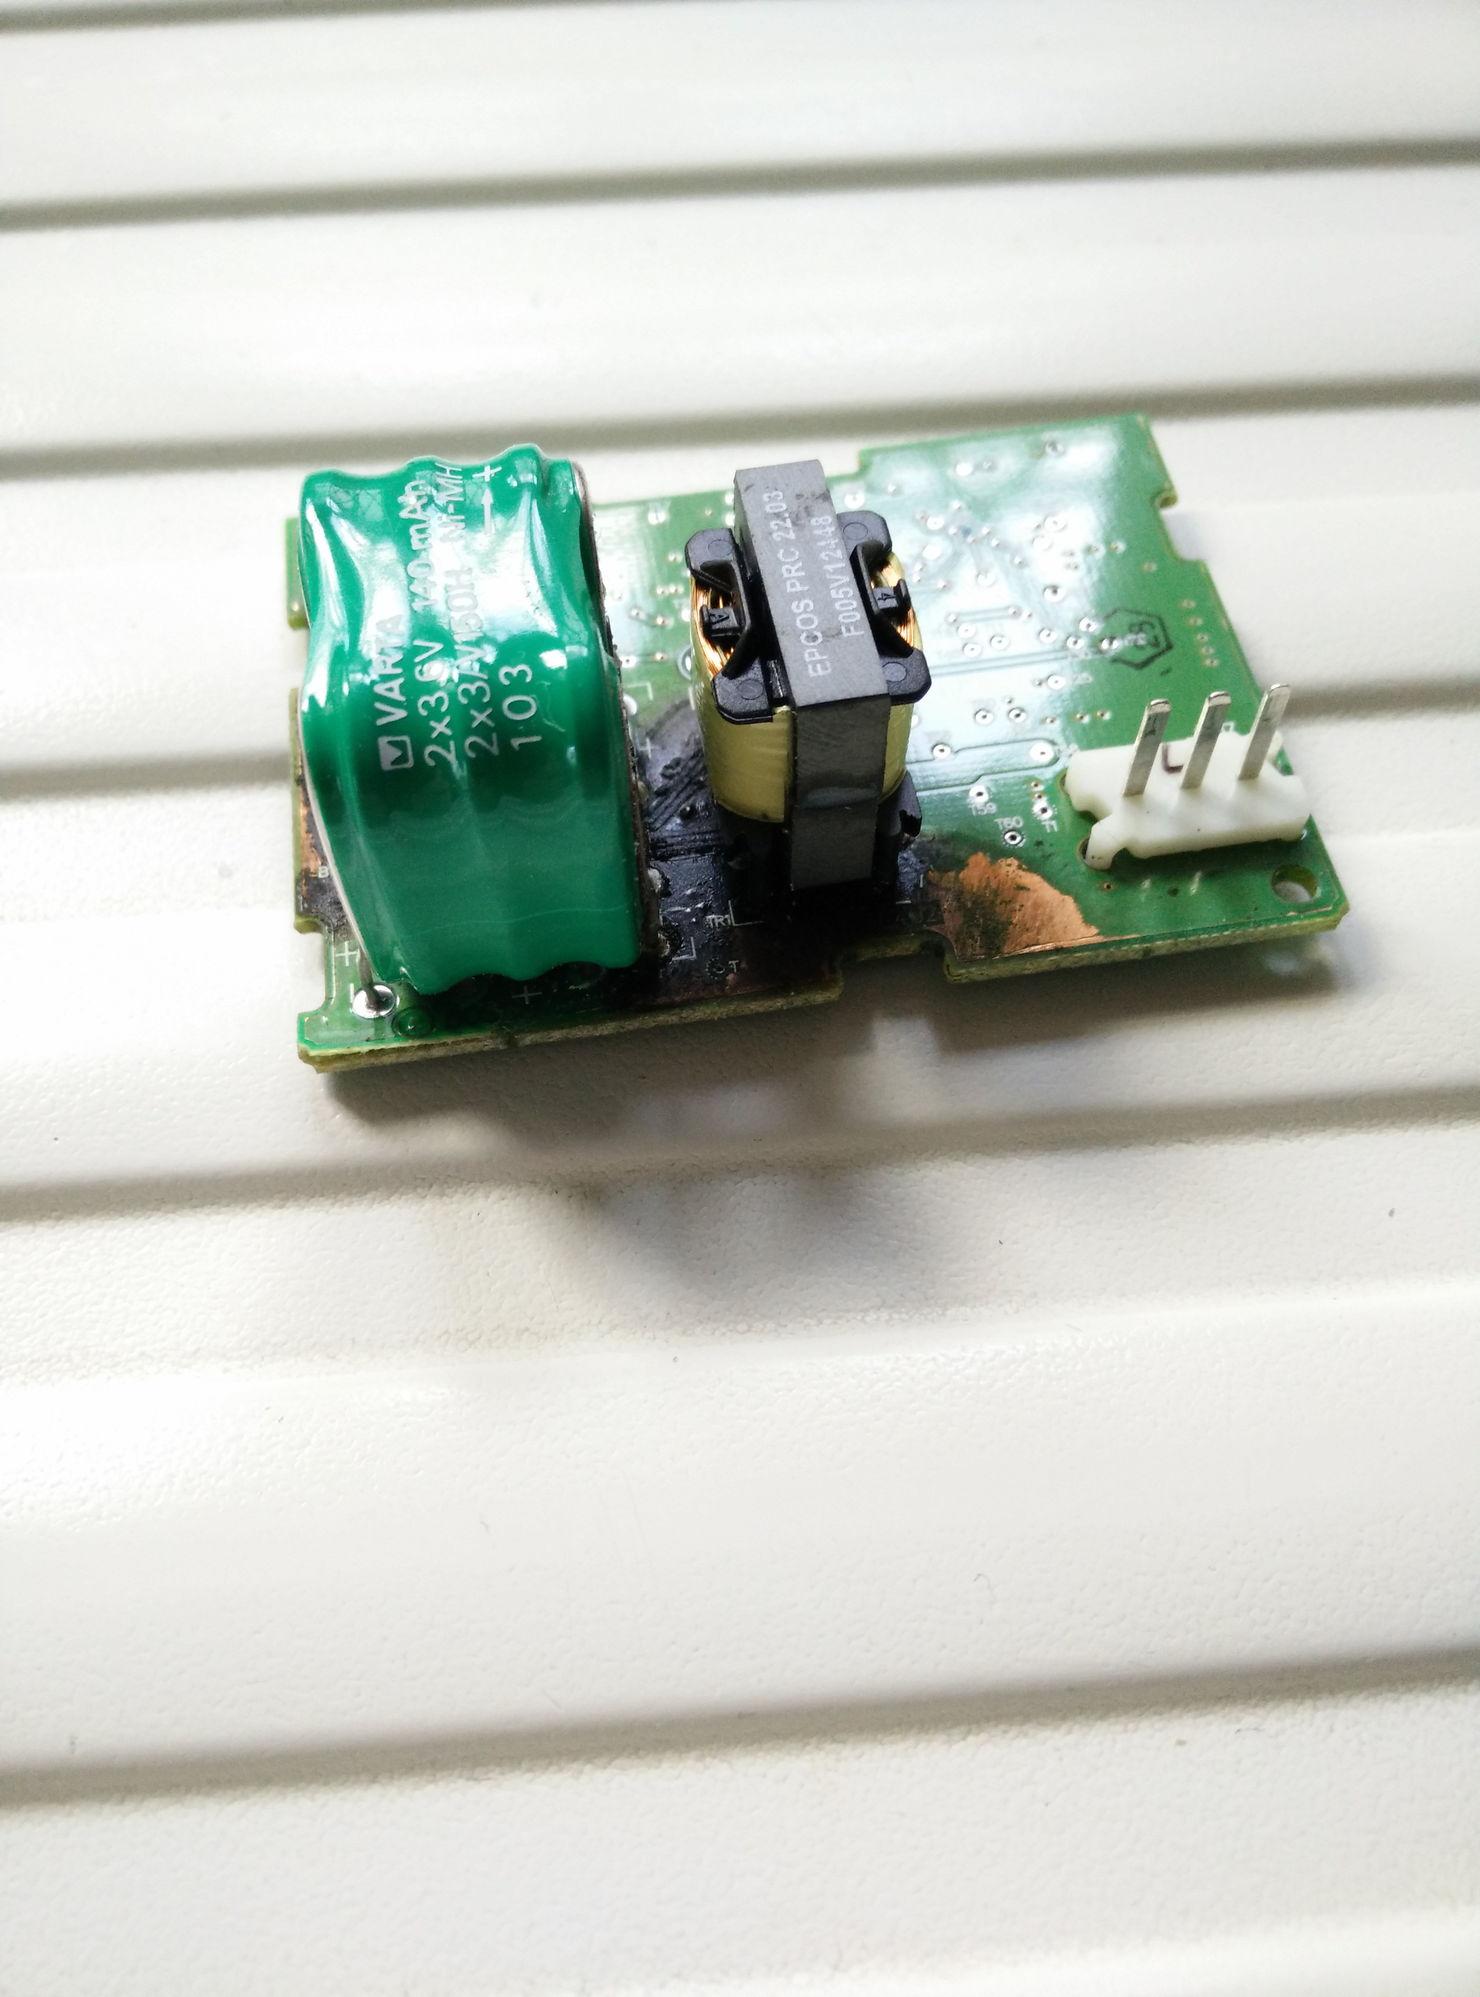 Land Rover 90 Fuse Box Upgrade Auto Electrical Wiring Diagram Defender Ebay Audi Tt Diagrams 99 Subaru Sti